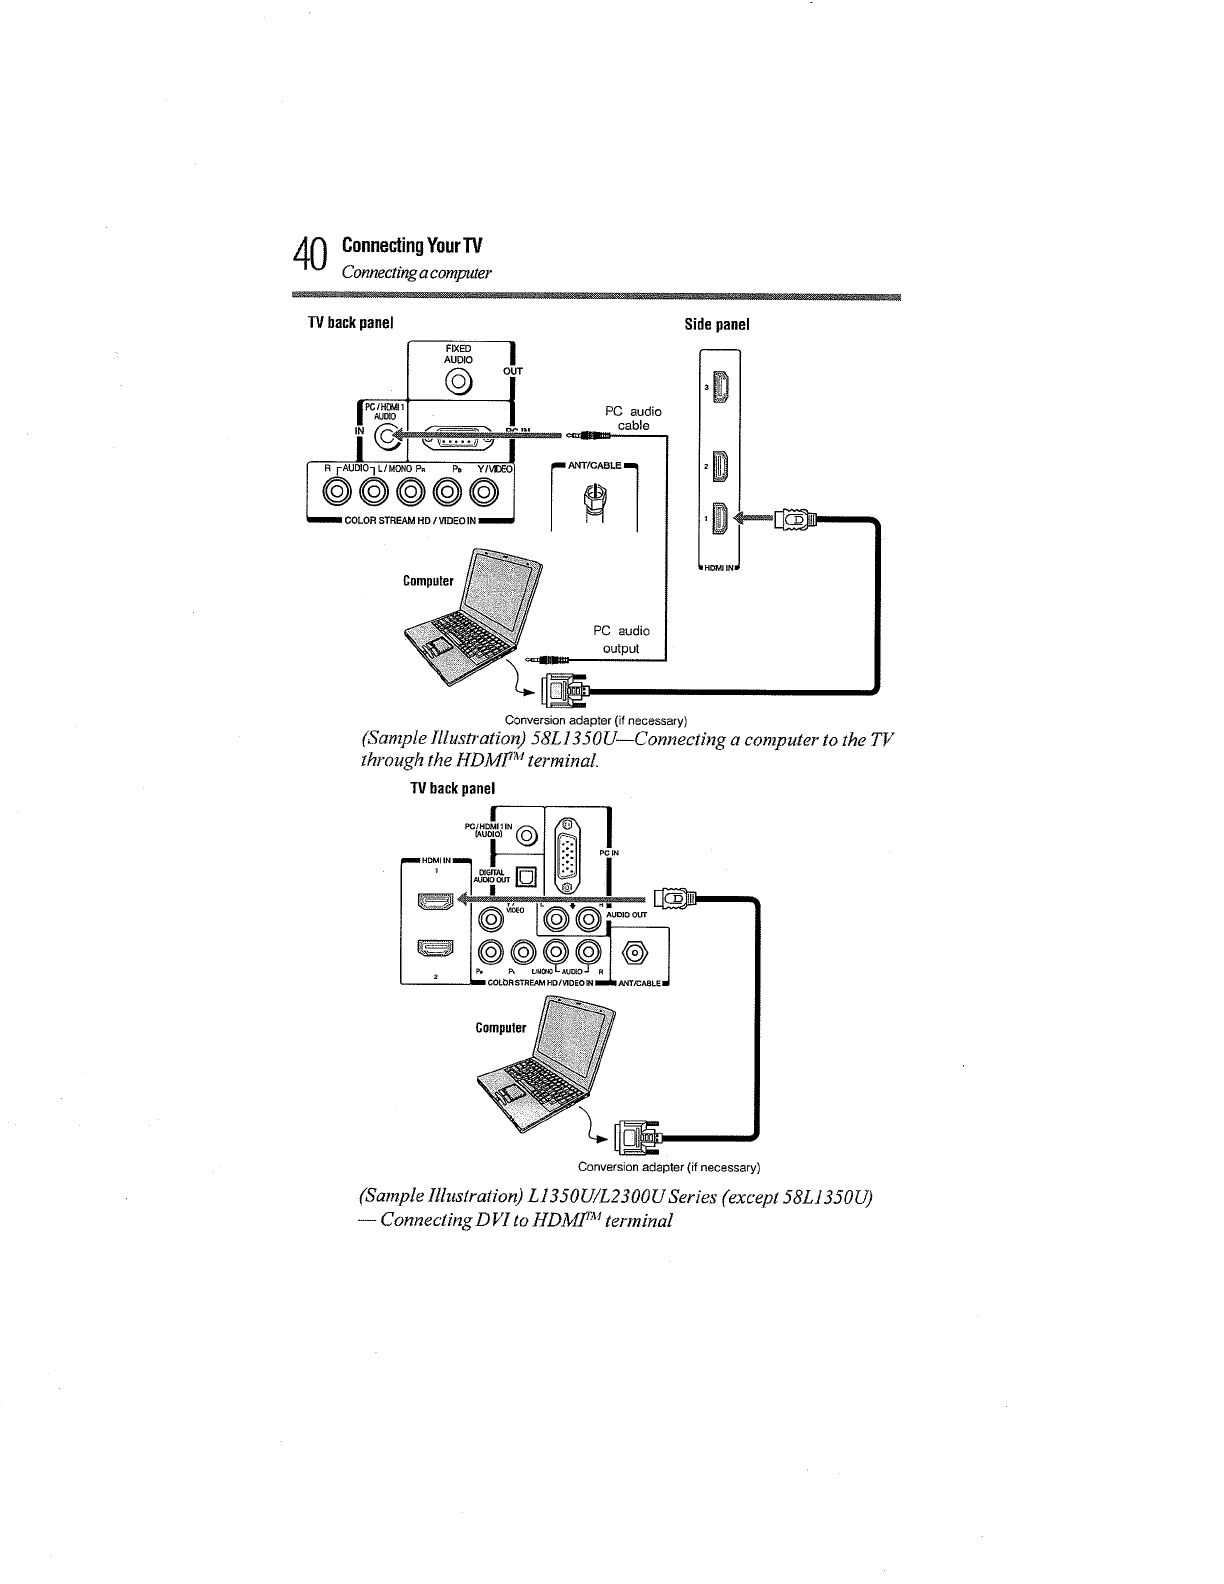 Toshiba 58L1350U User Manual LED TELEVISION Manuals And